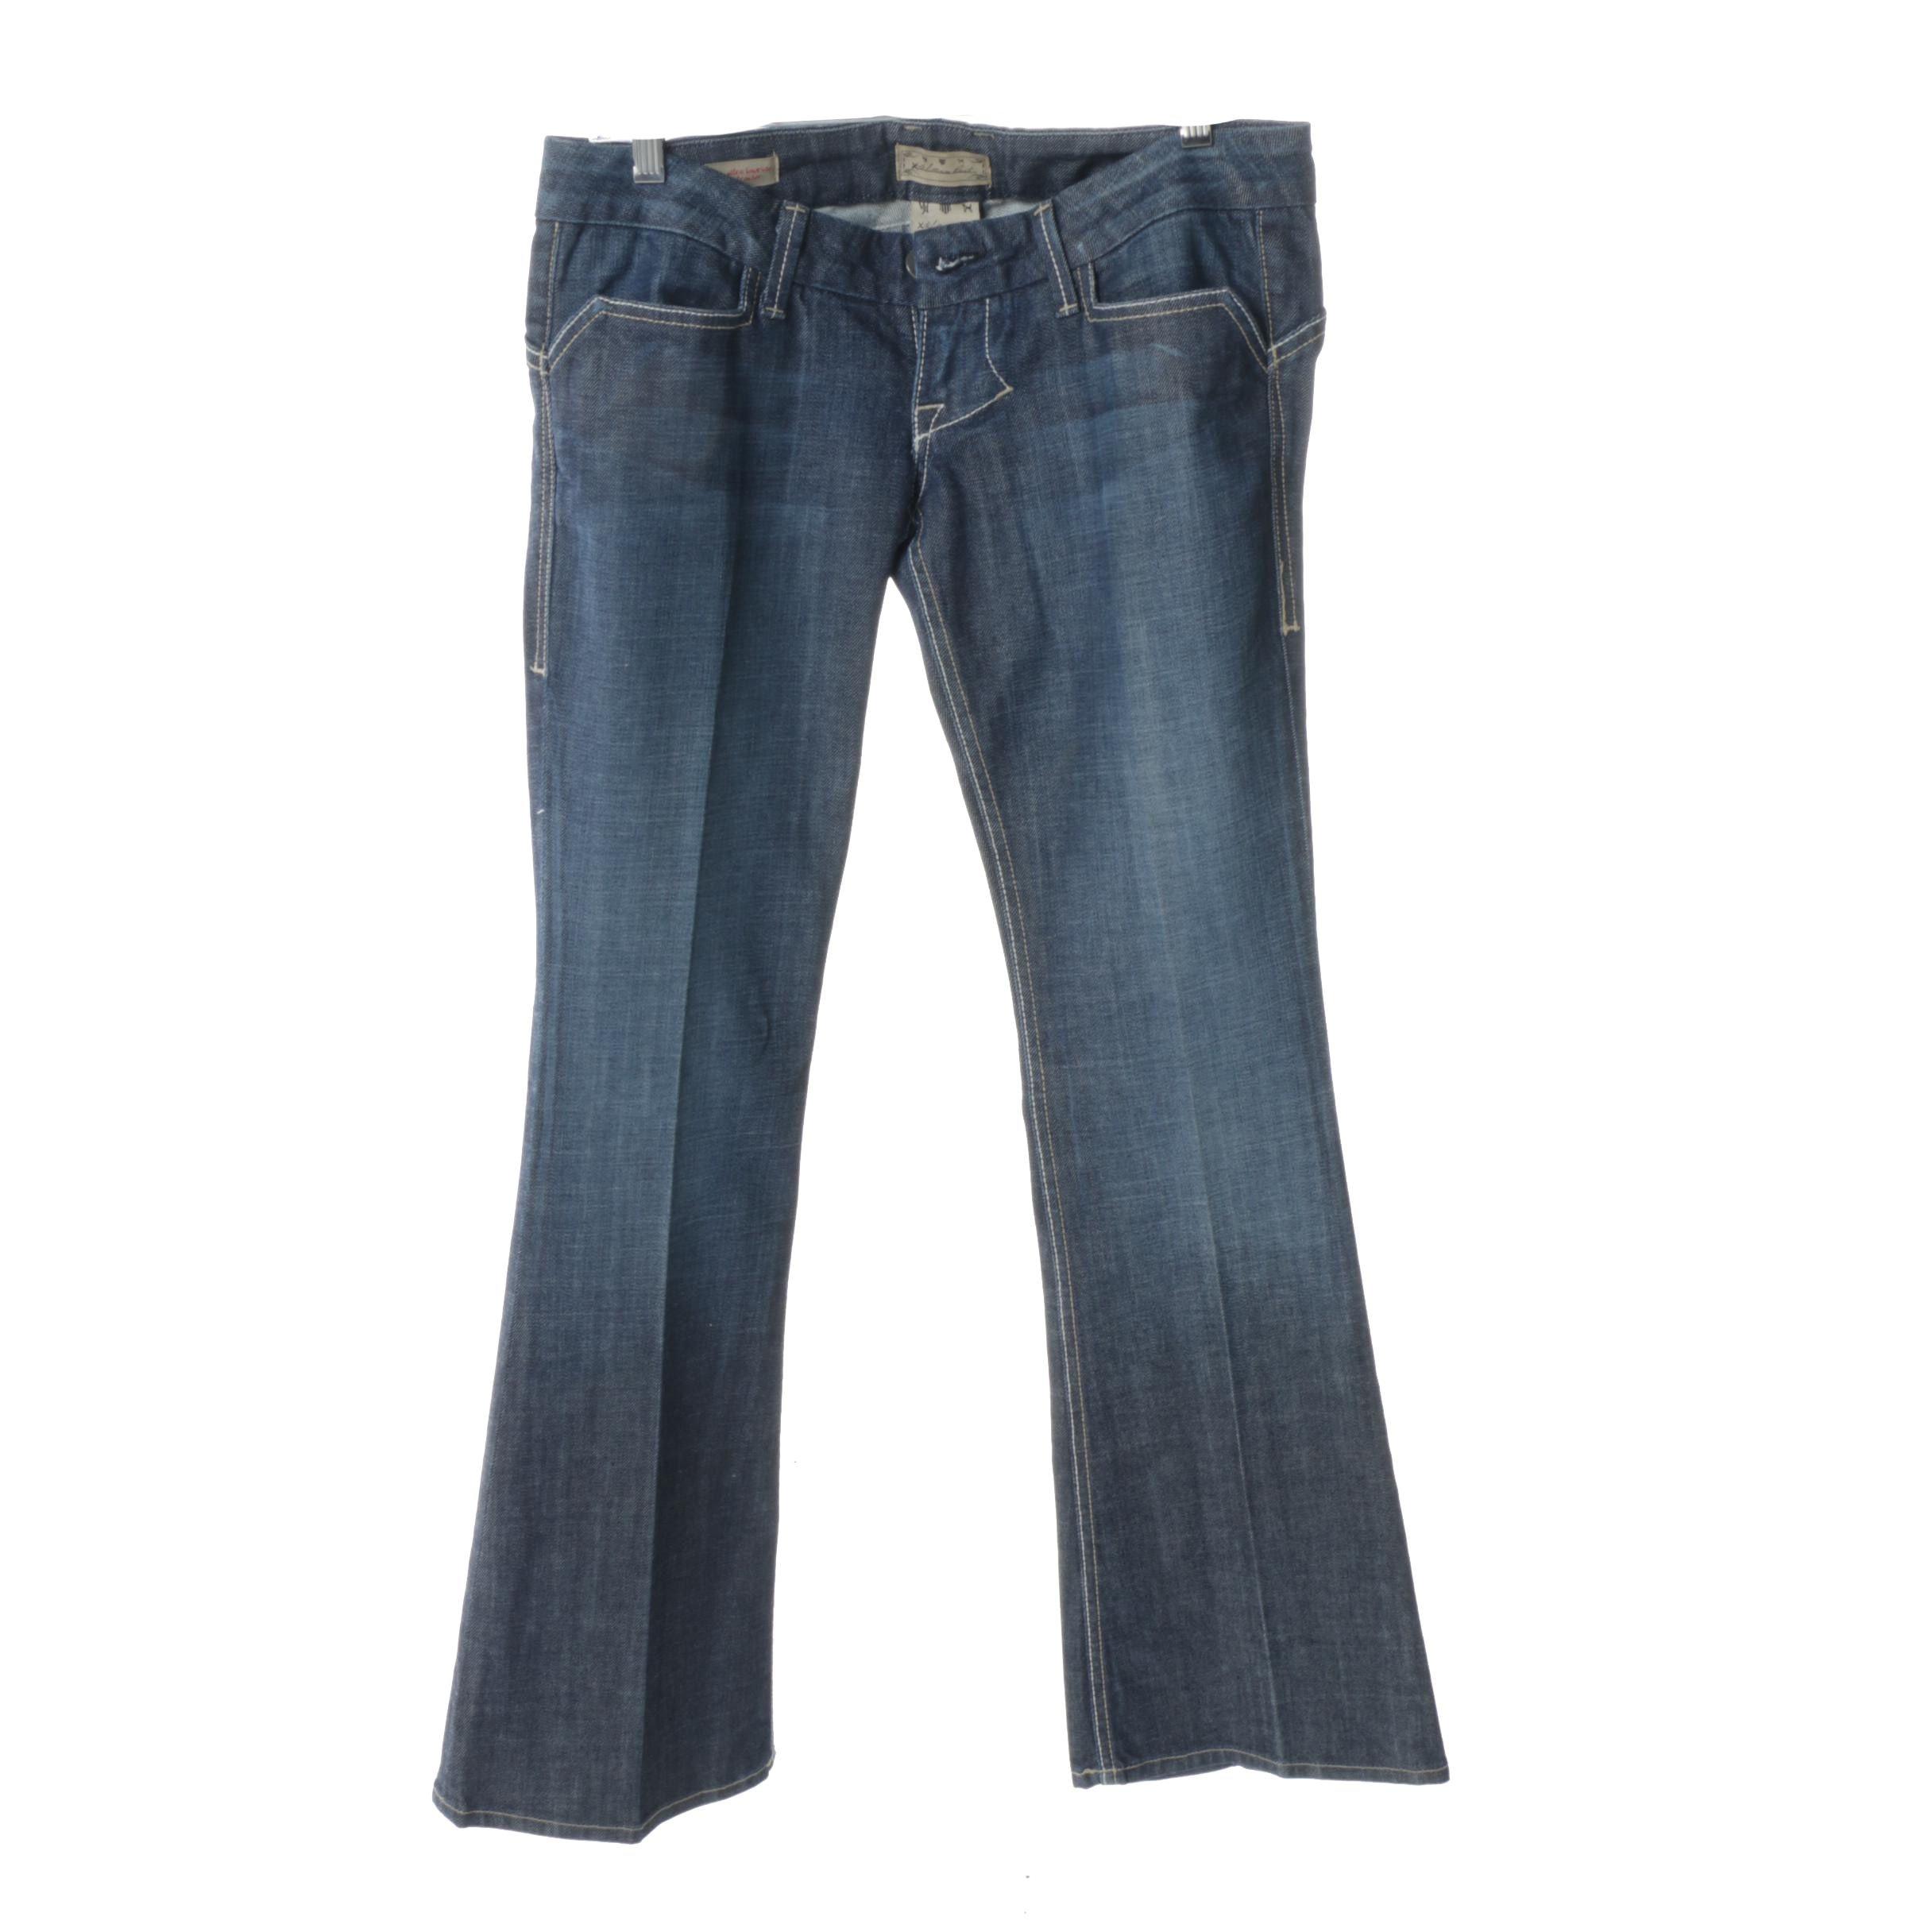 Women's William Rast Savoy Ultra Low Rise Trouser Jeans